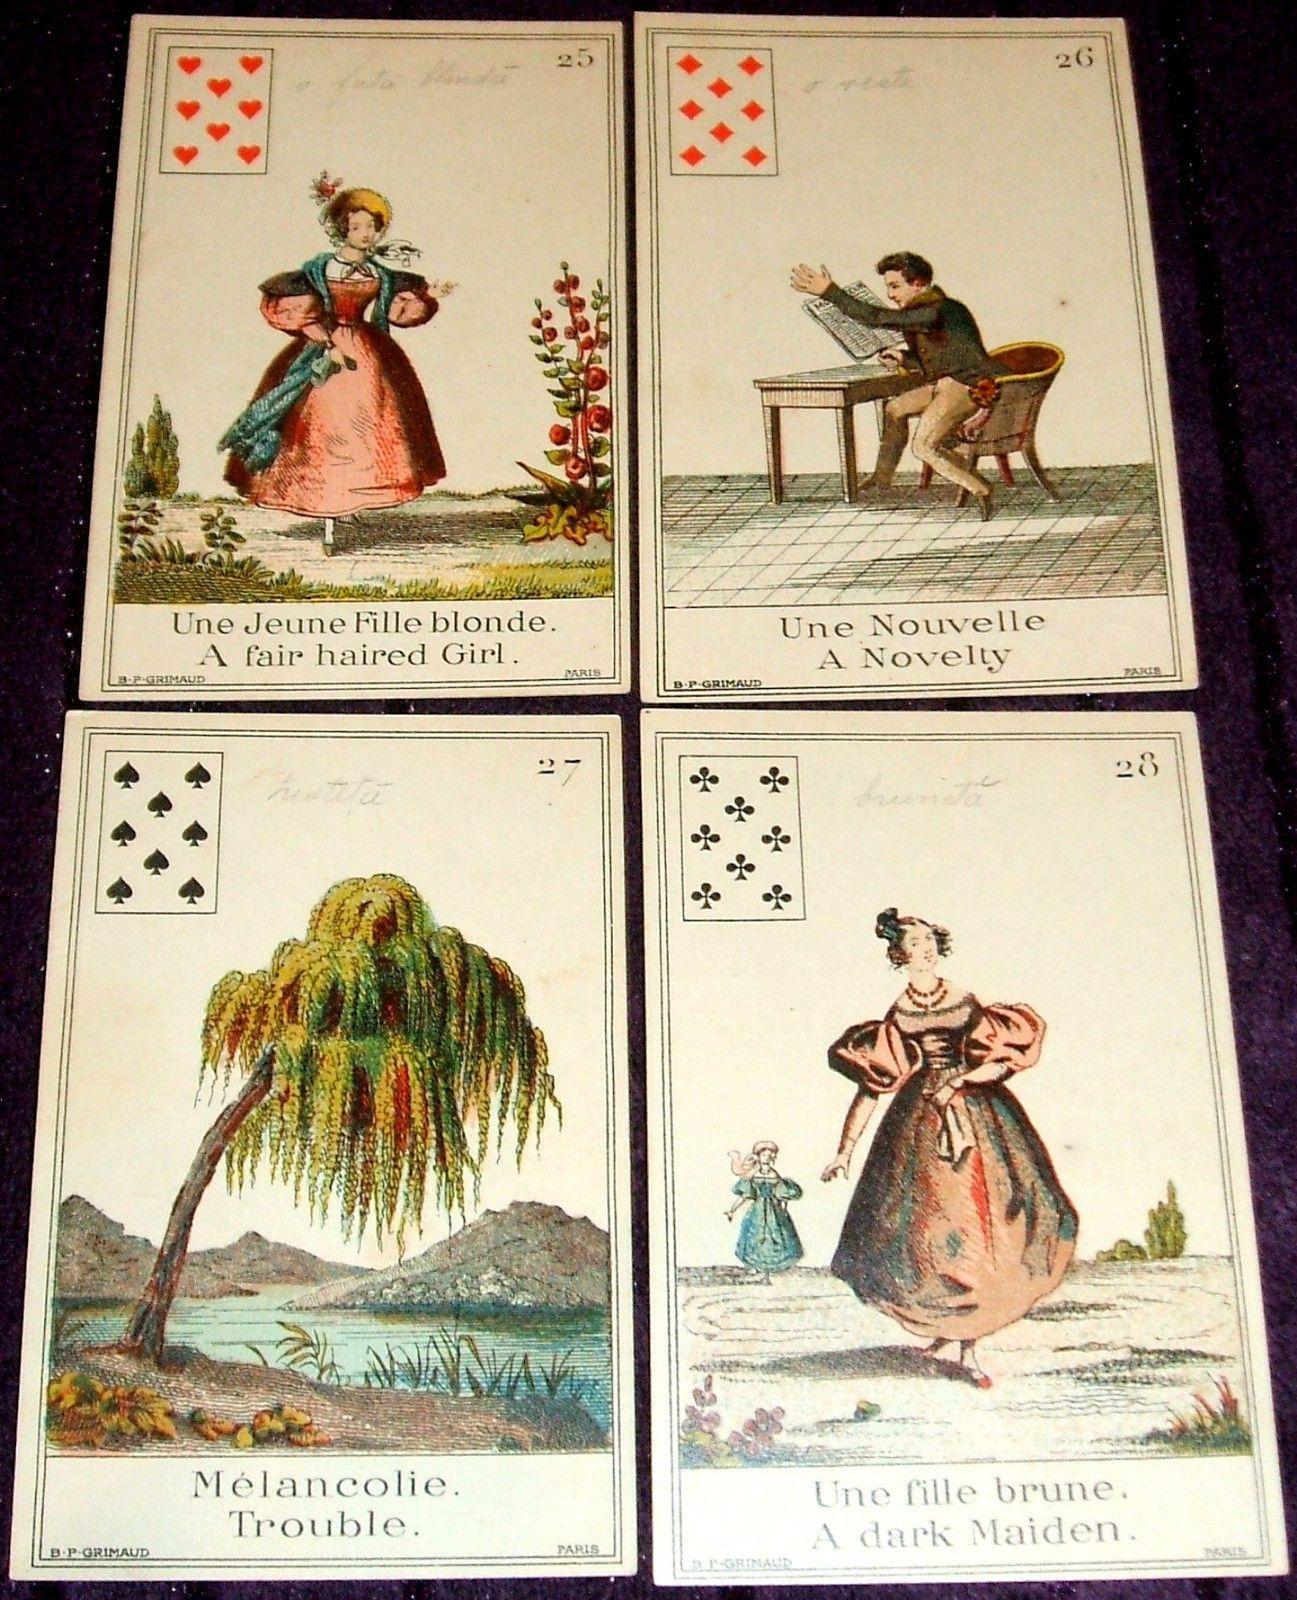 1890 The Book Of Fate Livre Du Destin Tarot Complete Cards Set By B P Grimaud Card Set Tarot Cards